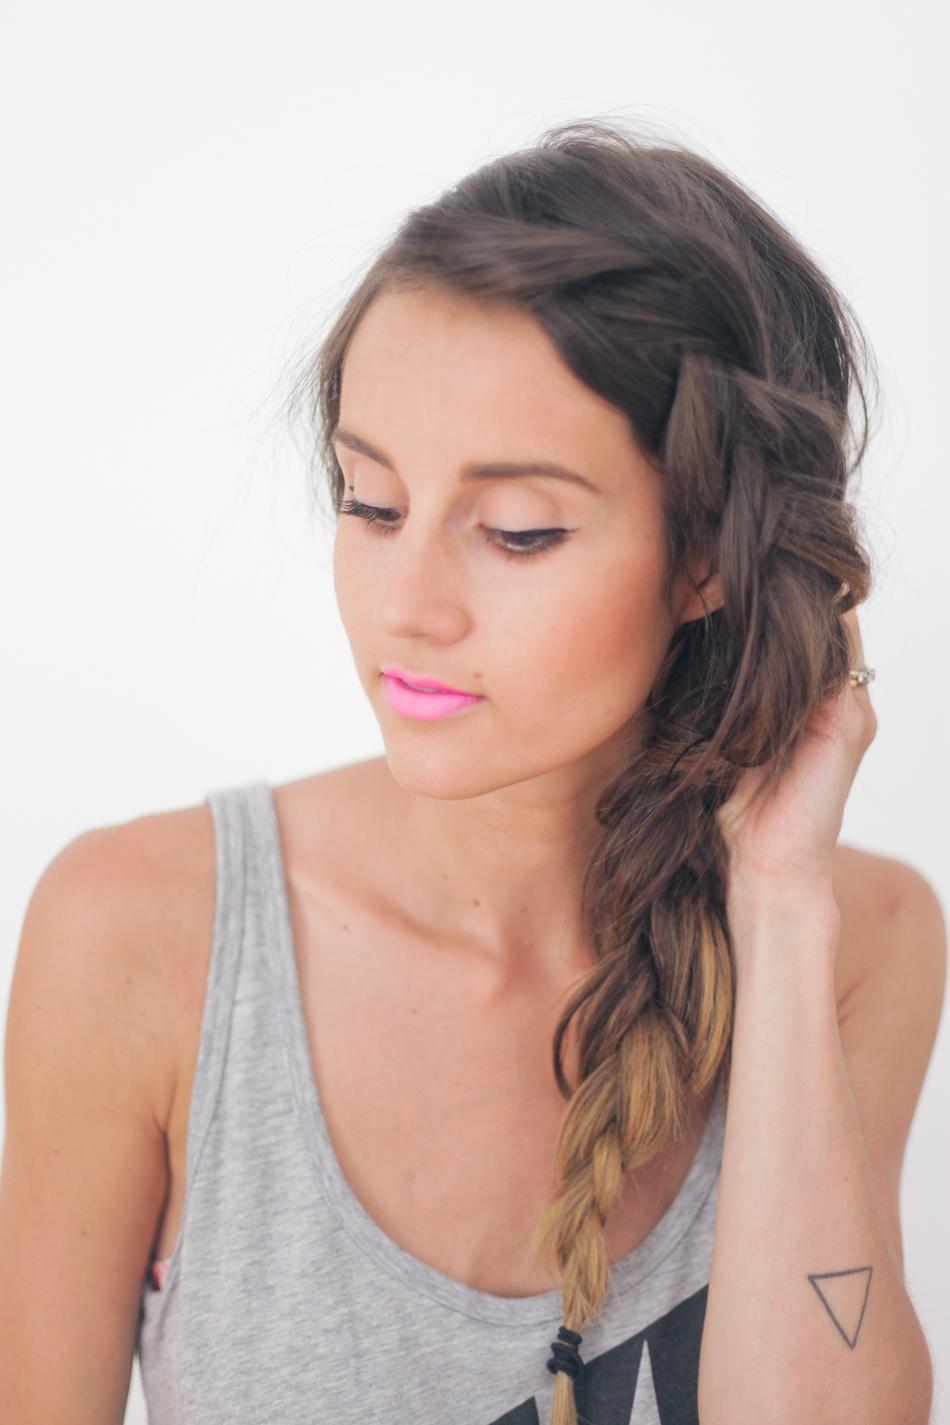 Surprising Hair Tutorial Thick Summer Braid Treasures Amp Travels Short Hairstyles For Black Women Fulllsitofus